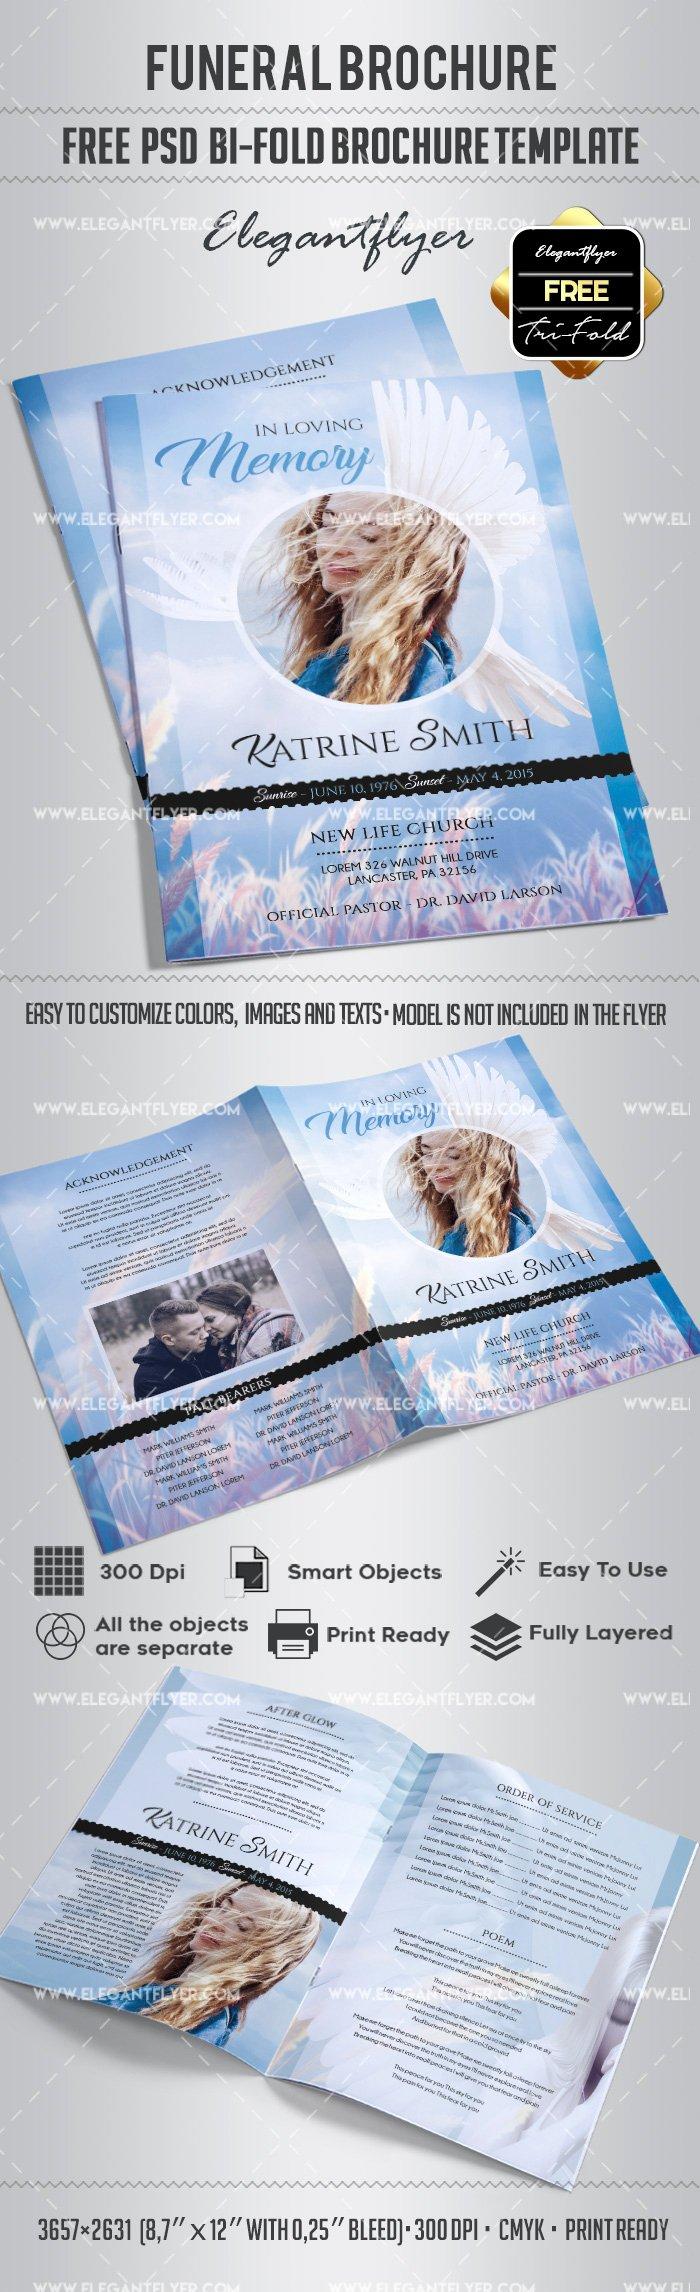 Bi Fold Program Template Inspirational Free Funeral Bi Fold Brochure – by Elegantflyer